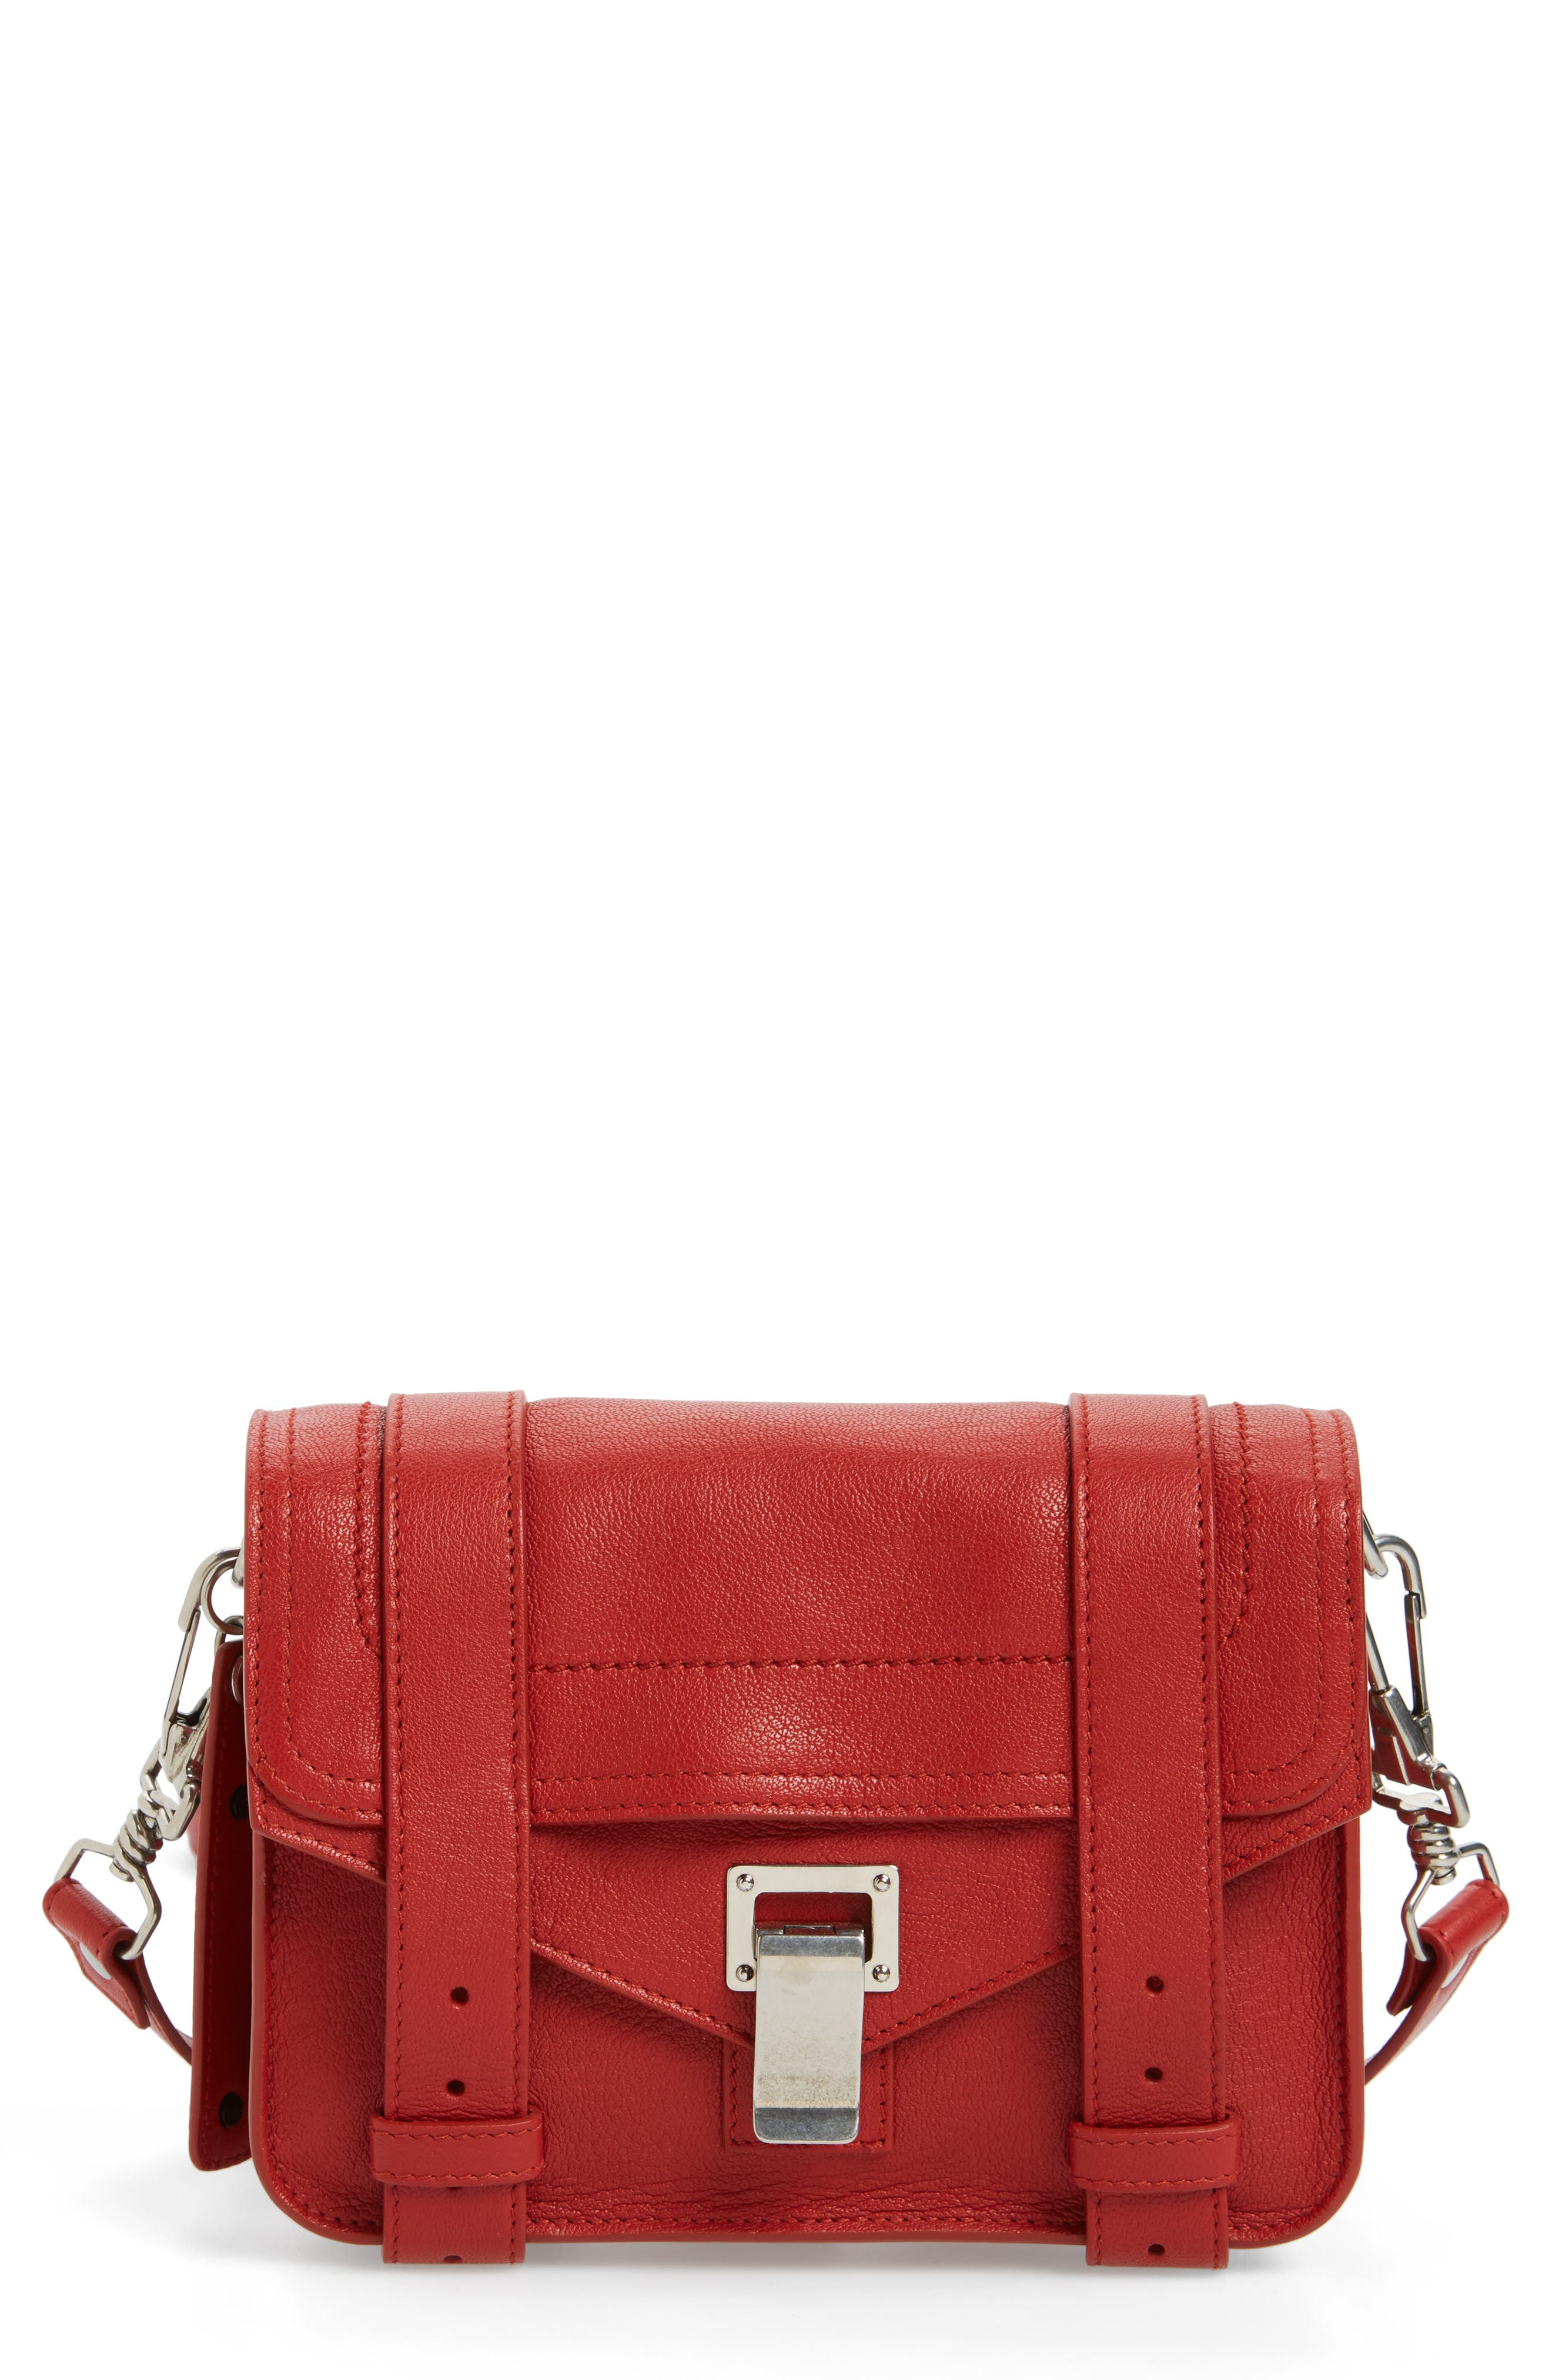 Alternate Image 1 Selected - Proenza Schouler 'Mini PS1' Lambskin Leather Crossbody Bag